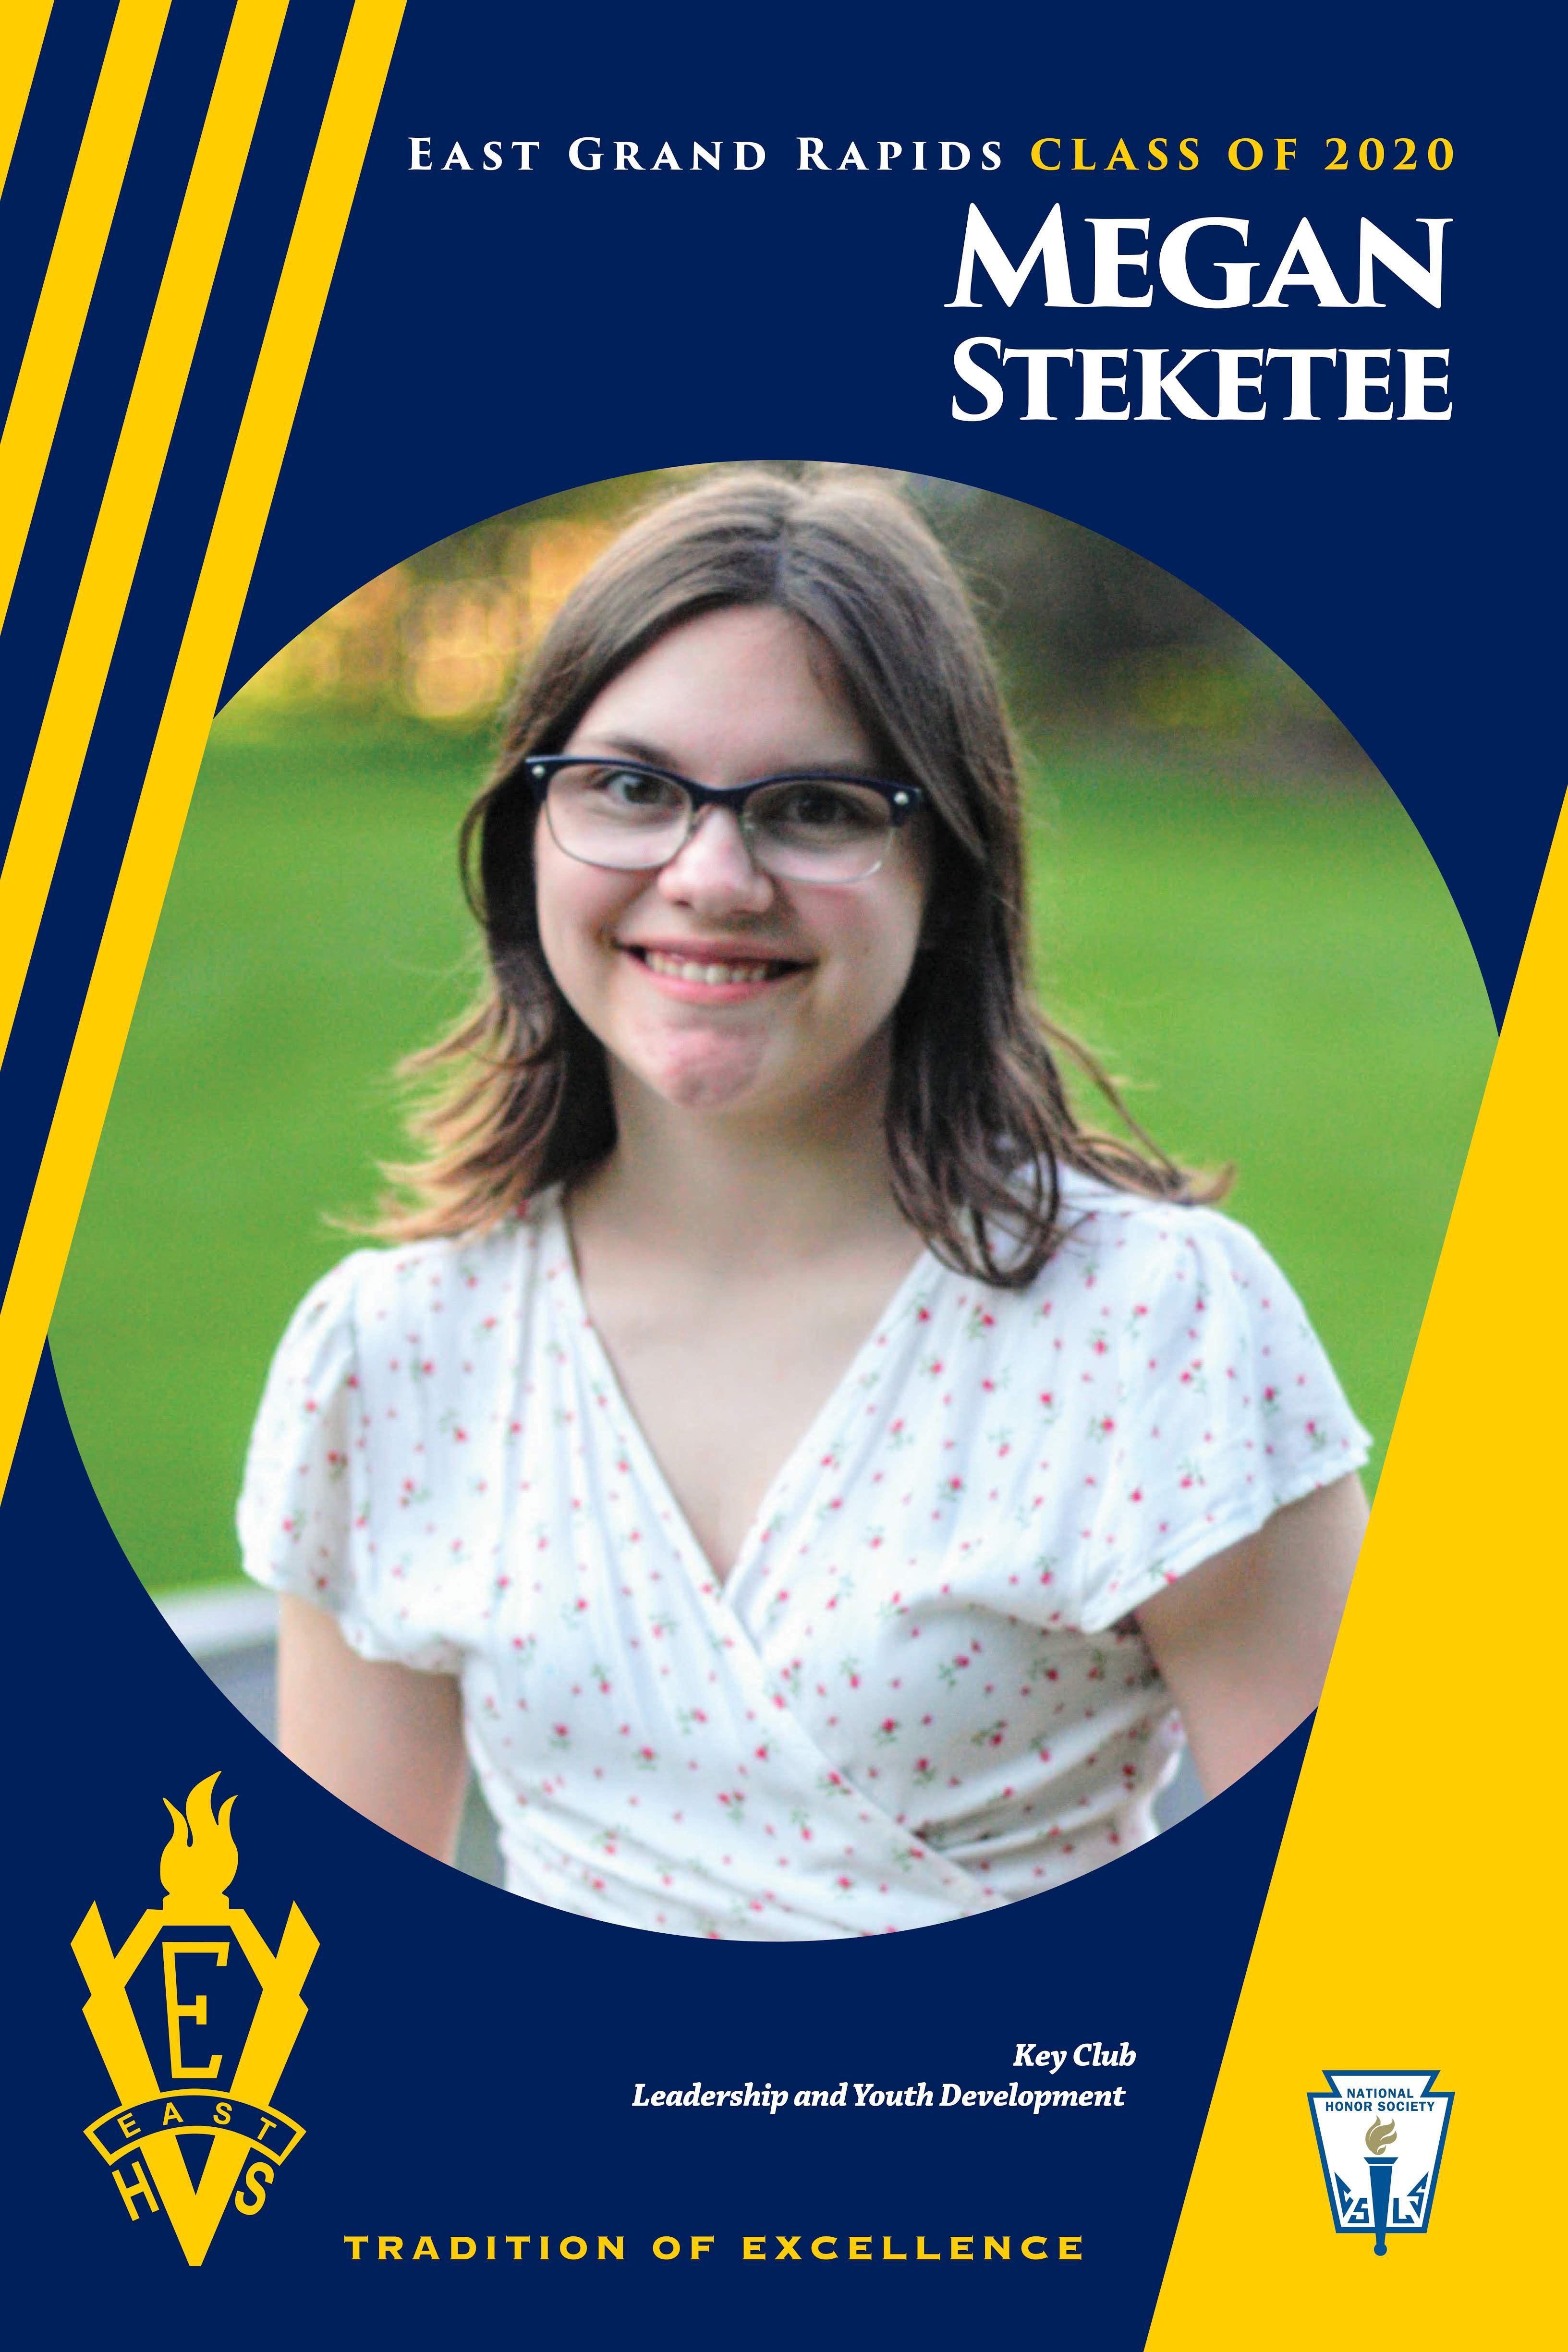 Megan Steketee